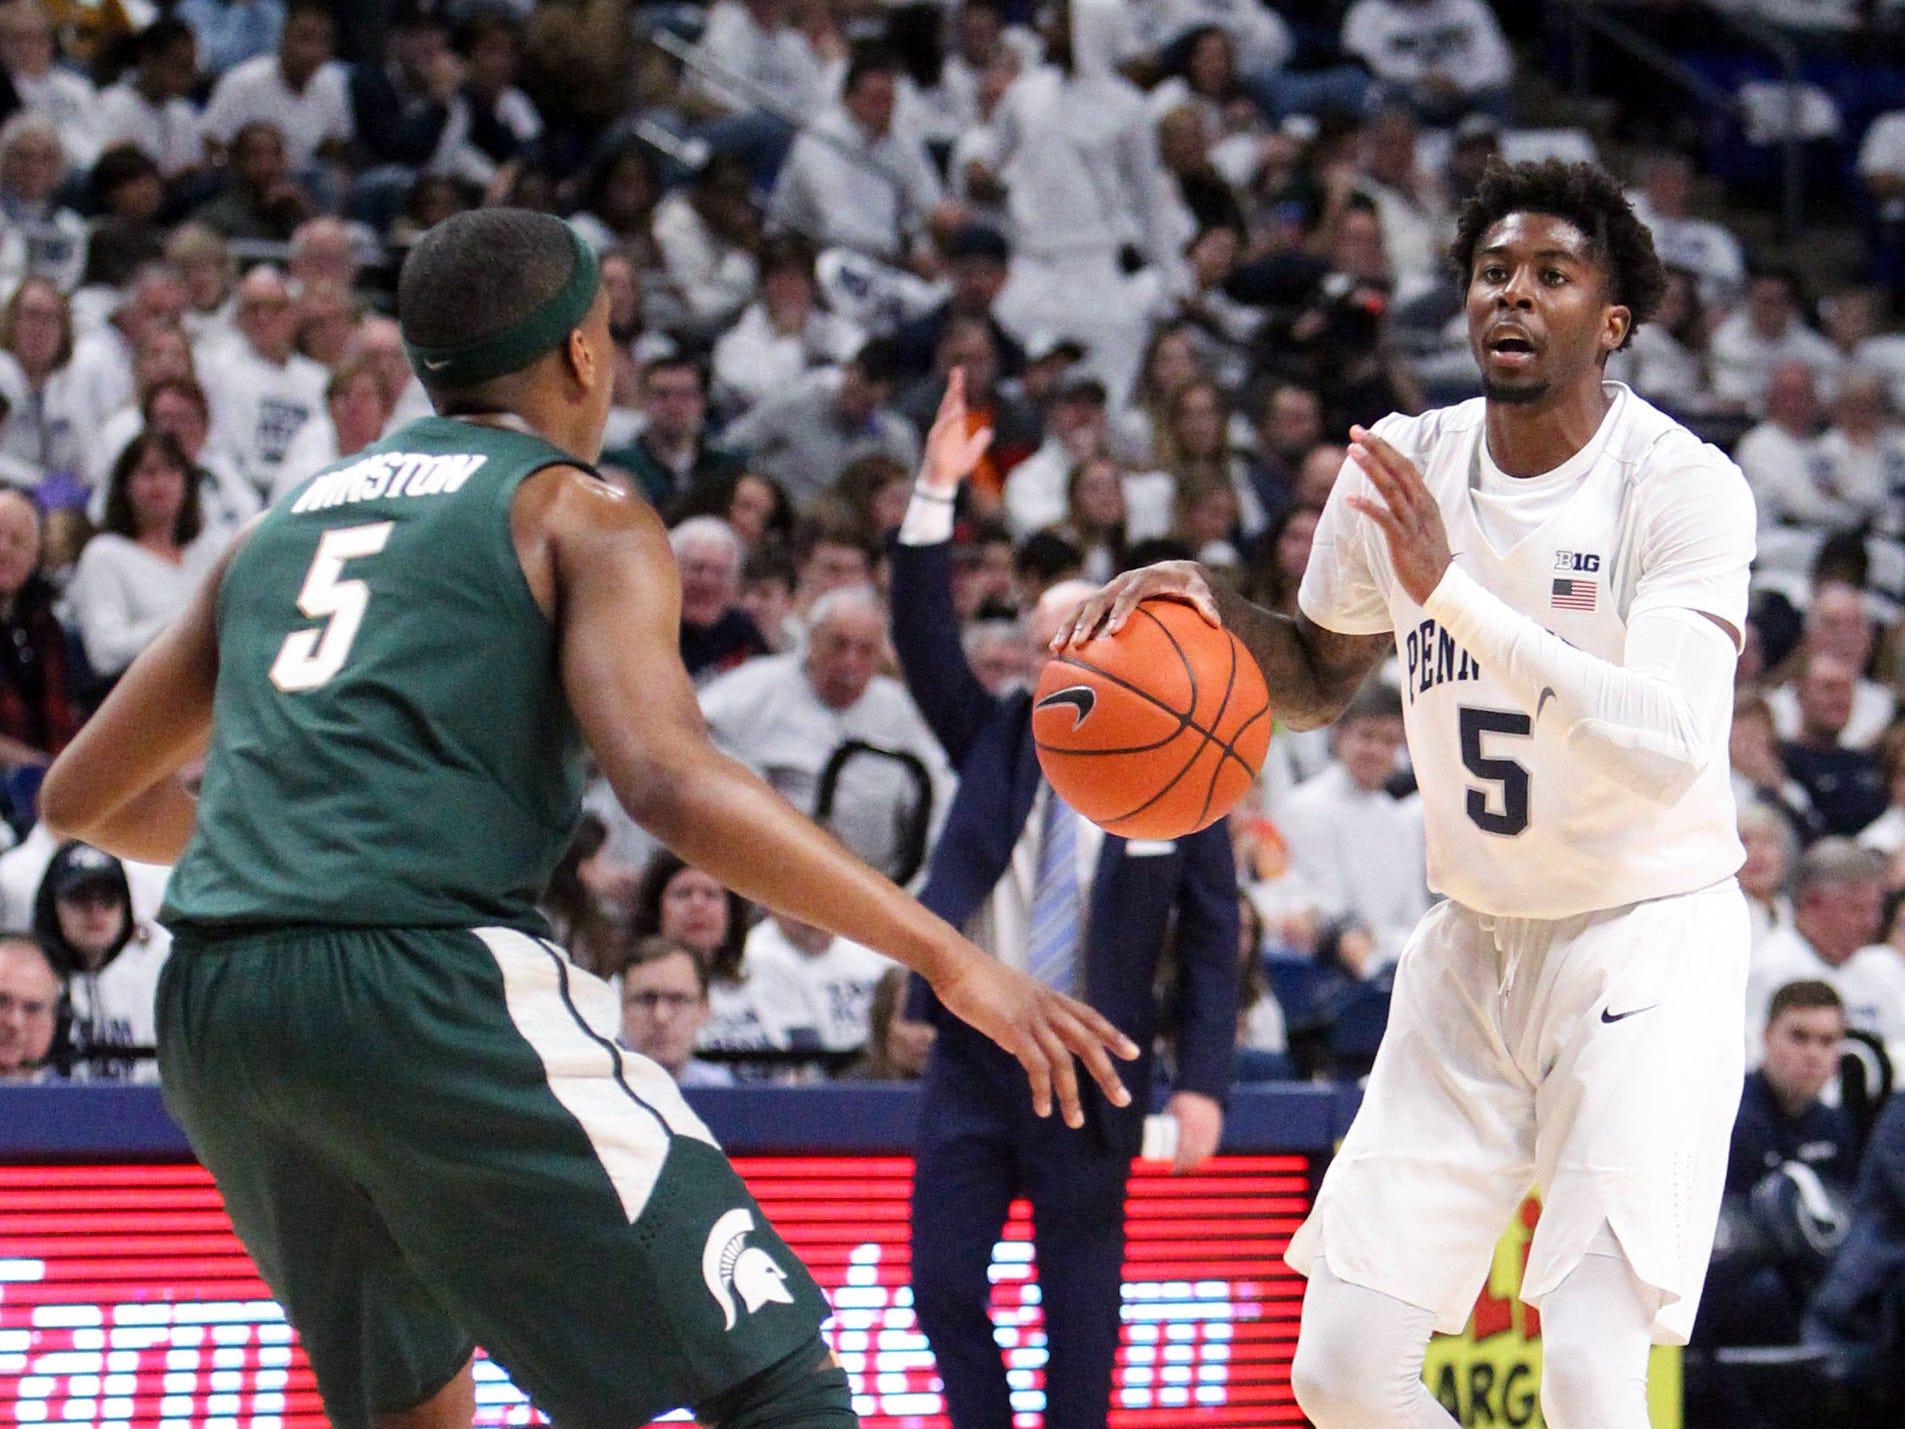 Penn State guard Jamari Wheeler dribbles against Michigan State guard Cassius Winston in the first half at Bryce Jordan Center, Sunday, Jan. 13, 2019.